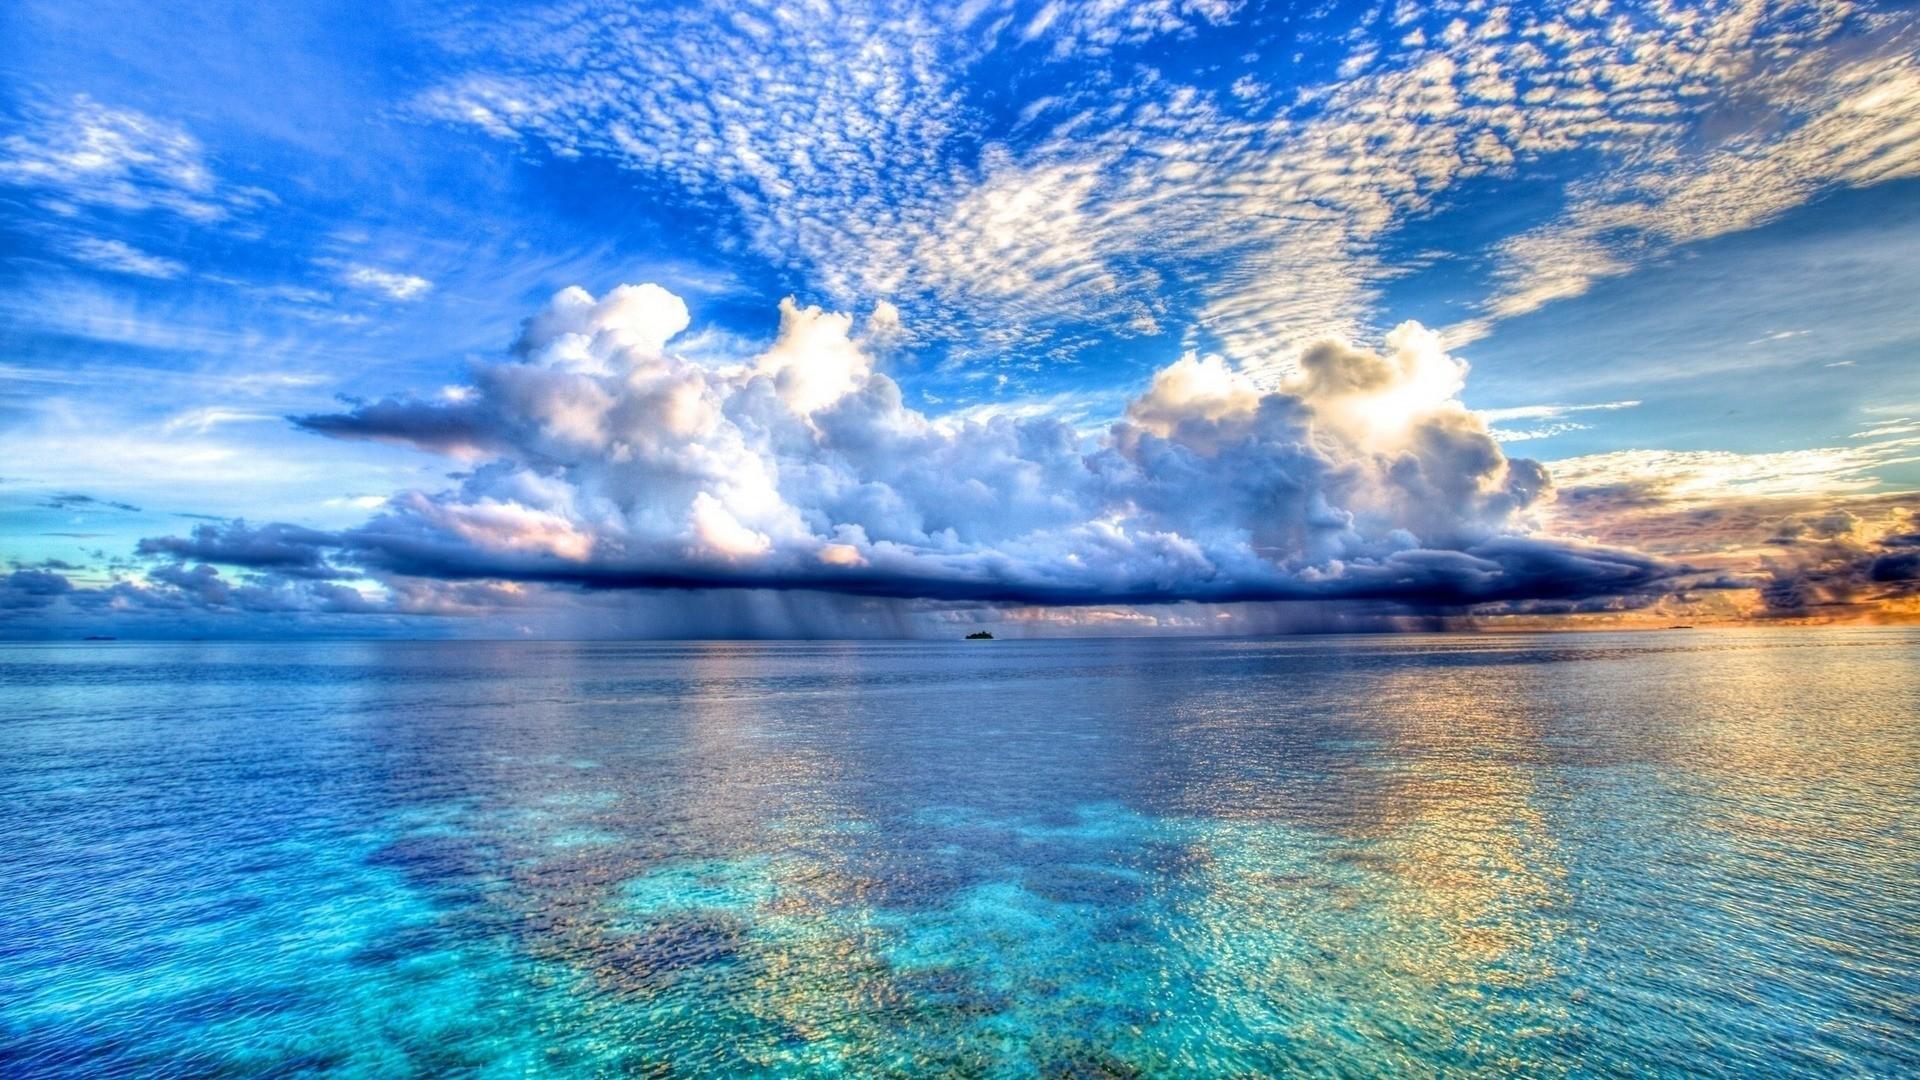 free ocean desktop wallpaper which is under the ocean wallpapers .